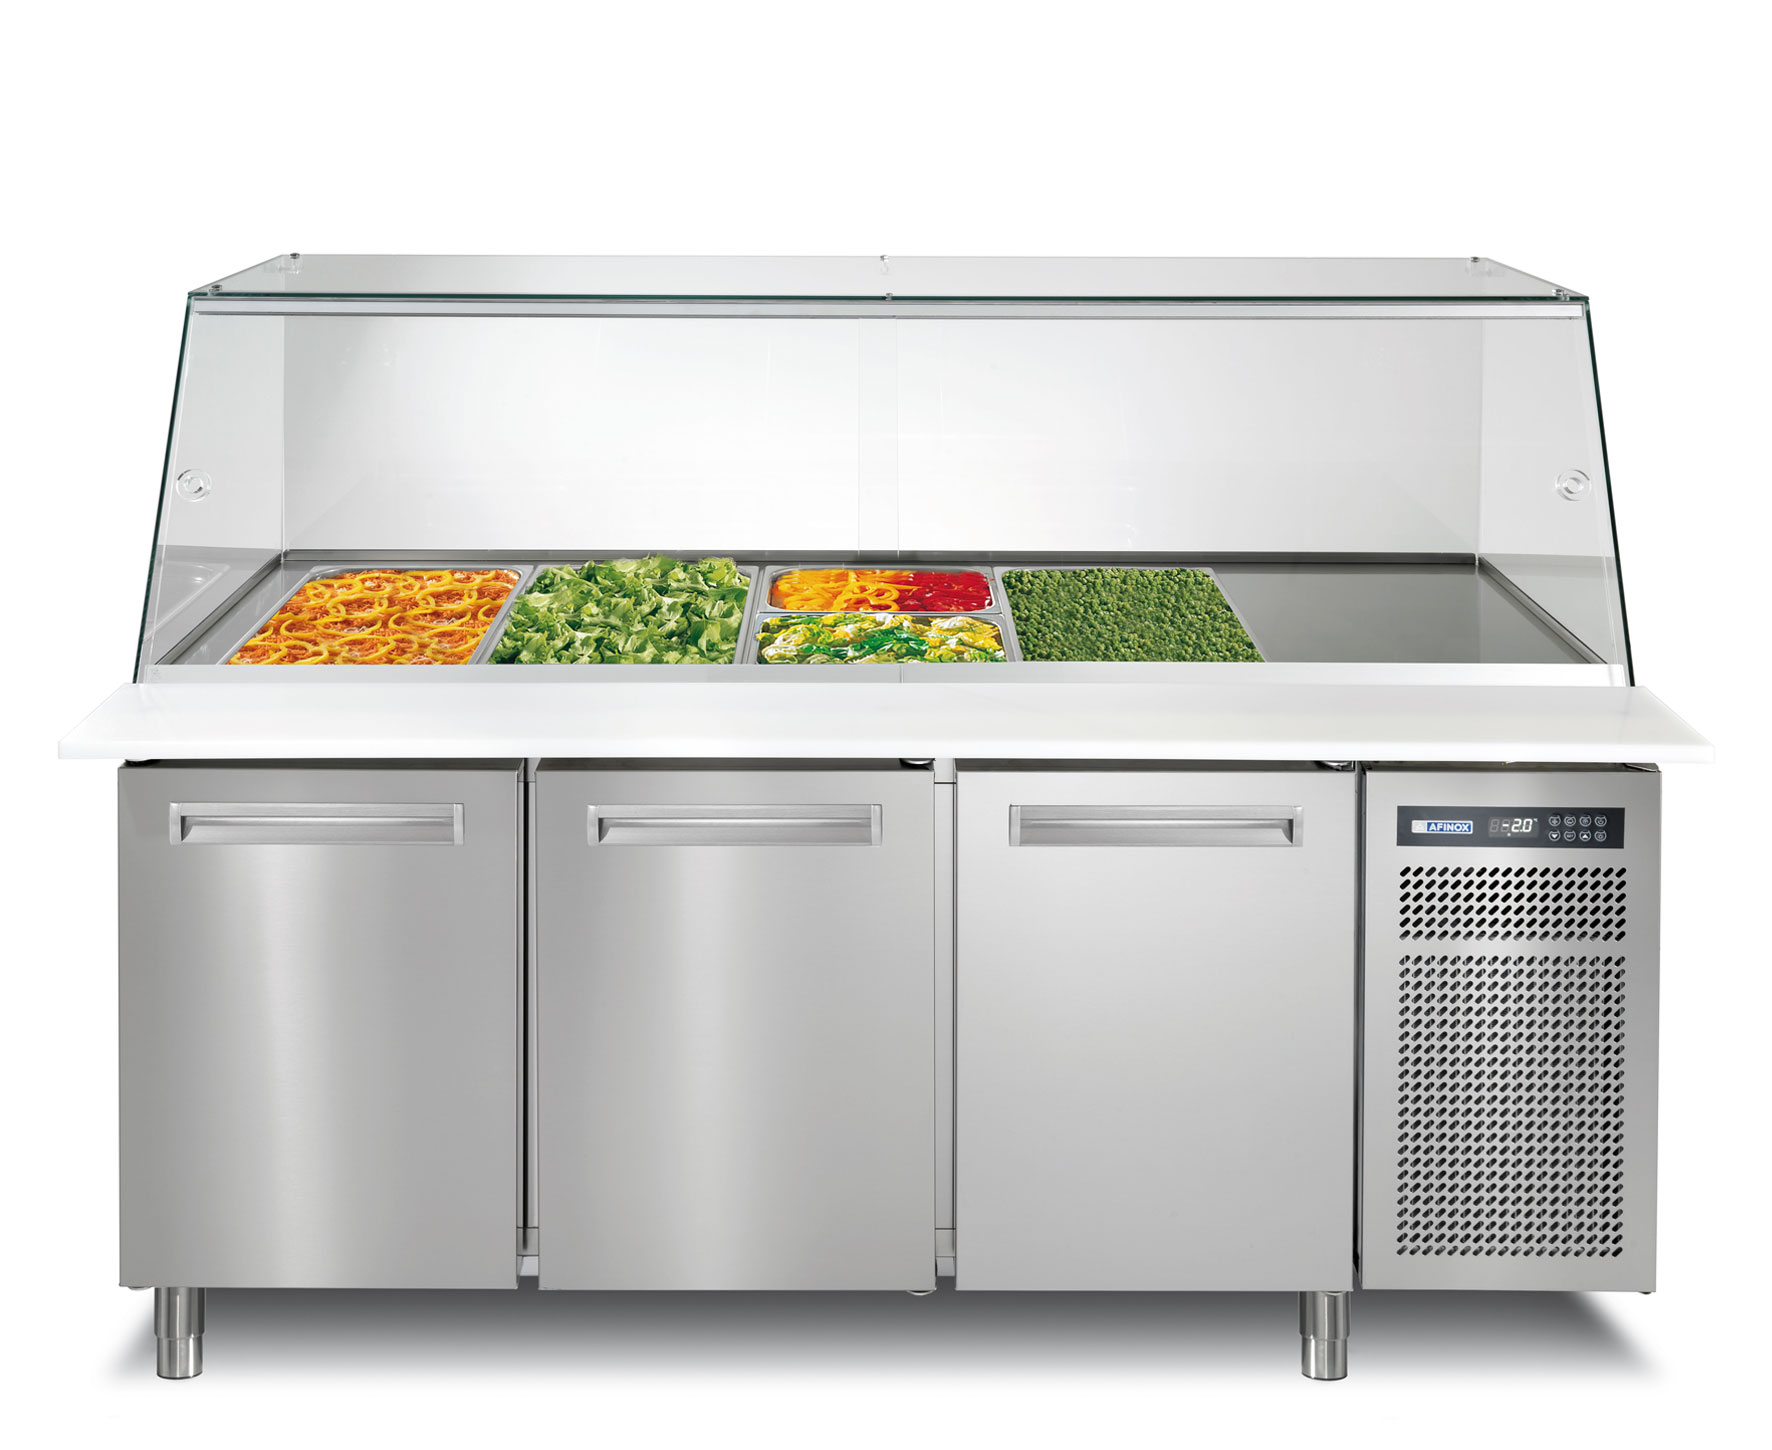 Tavoli refrigerati, refrigerated tables, mesas refrigeradas